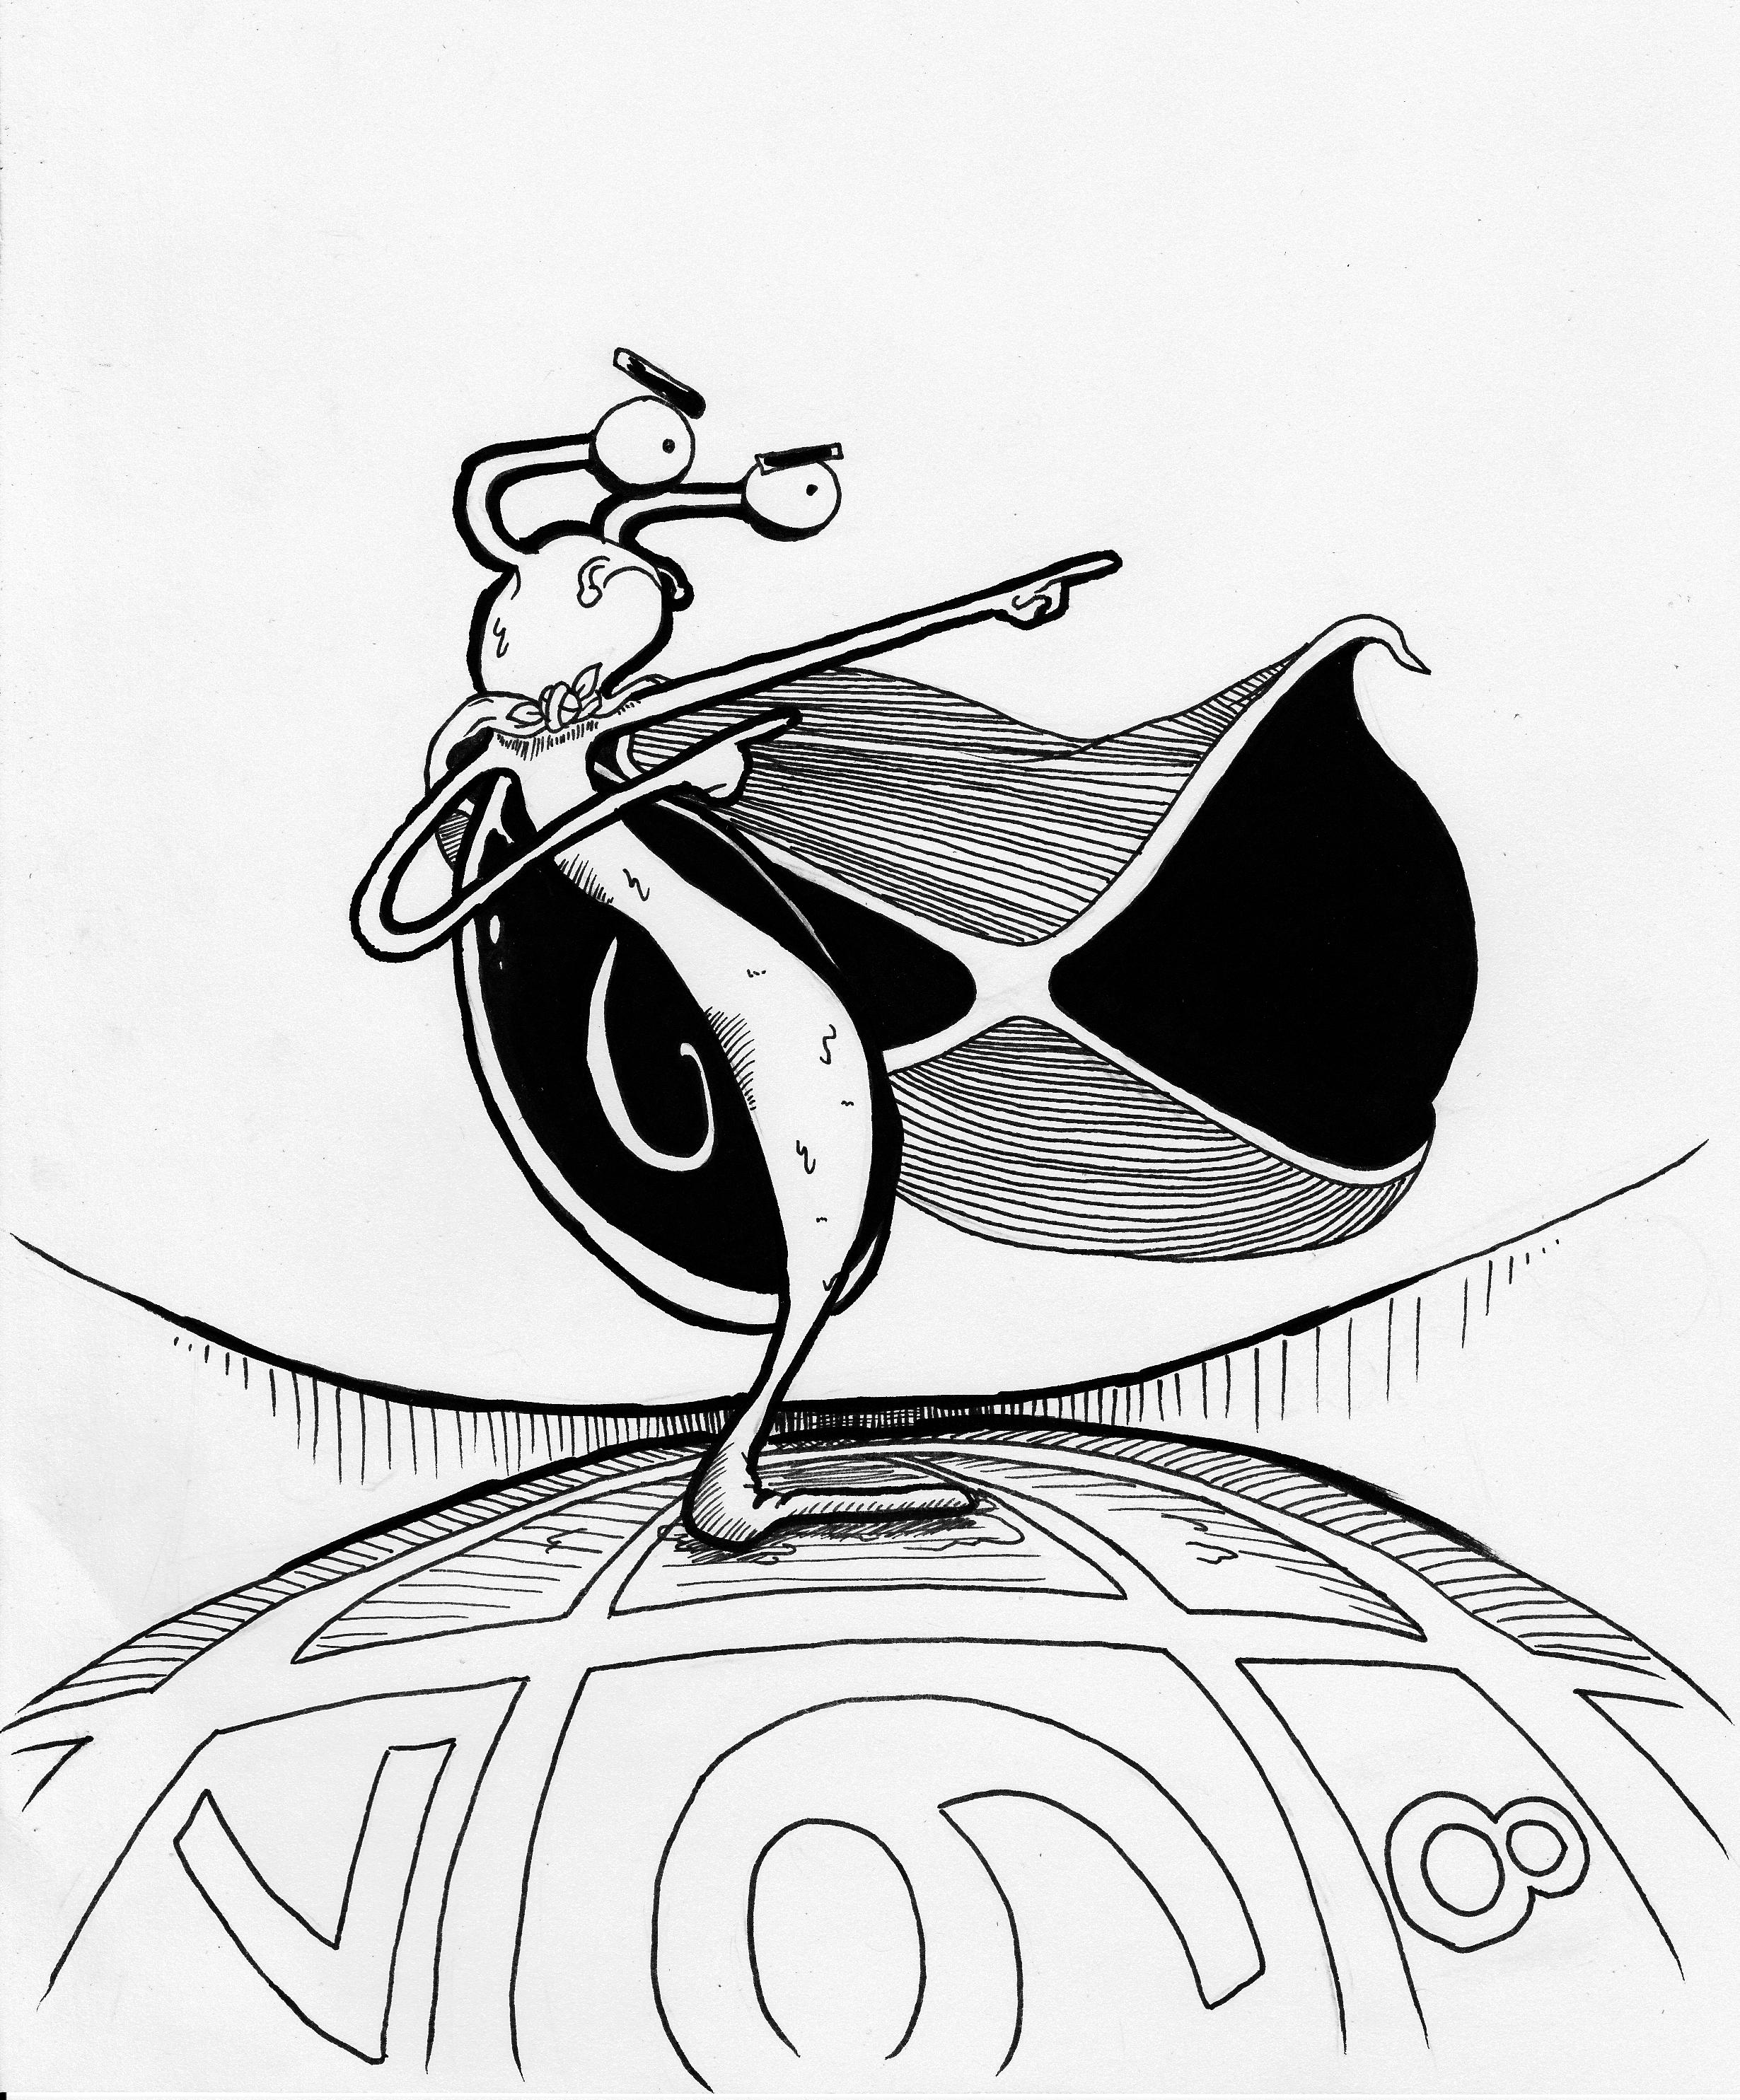 A Doodle A Day - Week 3 - Doodle #5